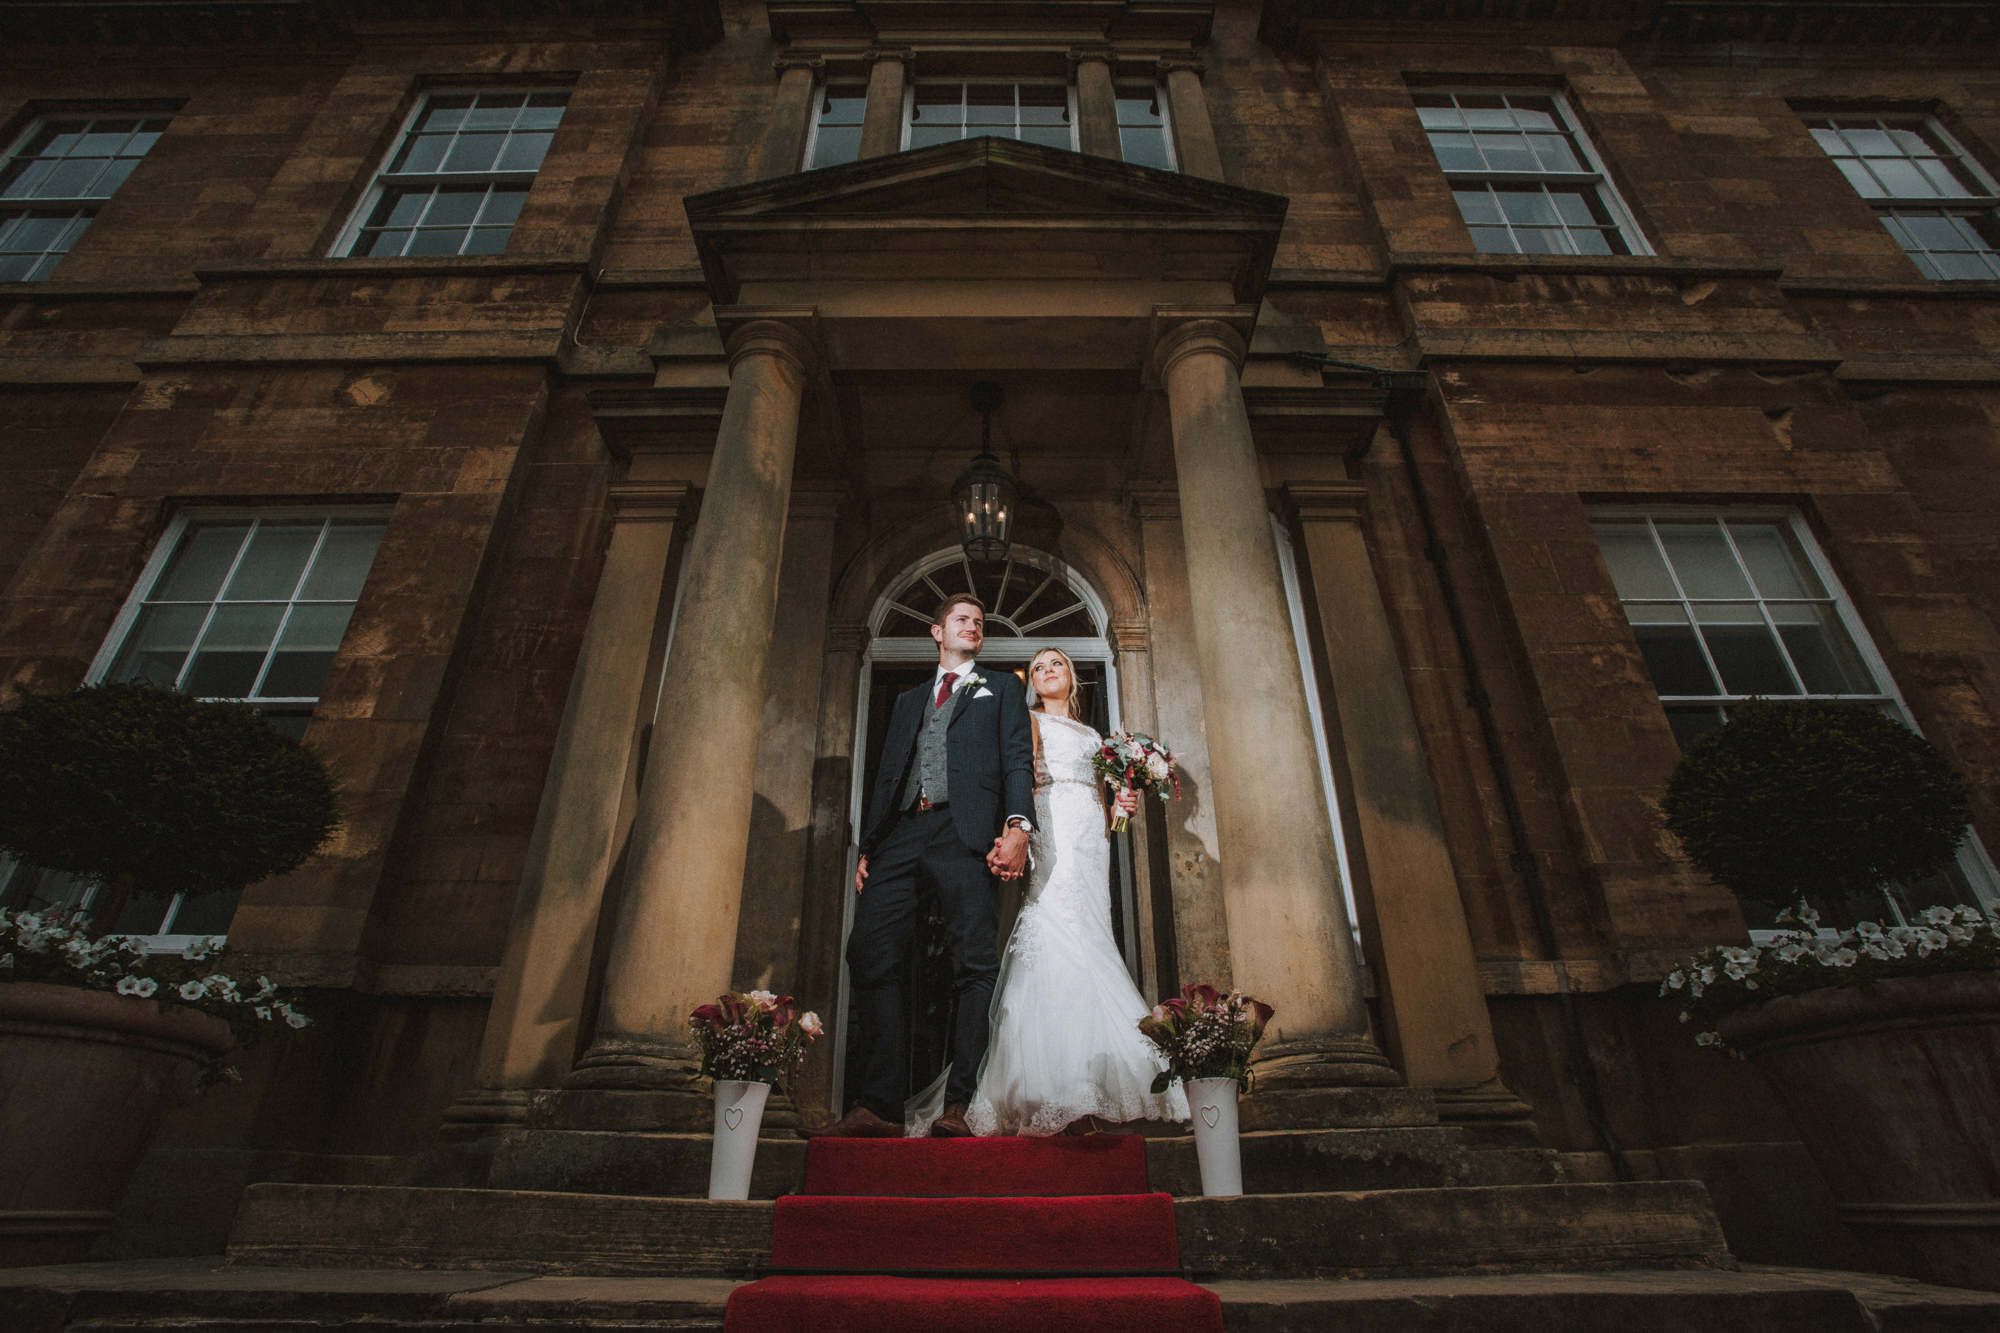 bowcliffe hall wedding photographers yorkshire-41.jpg